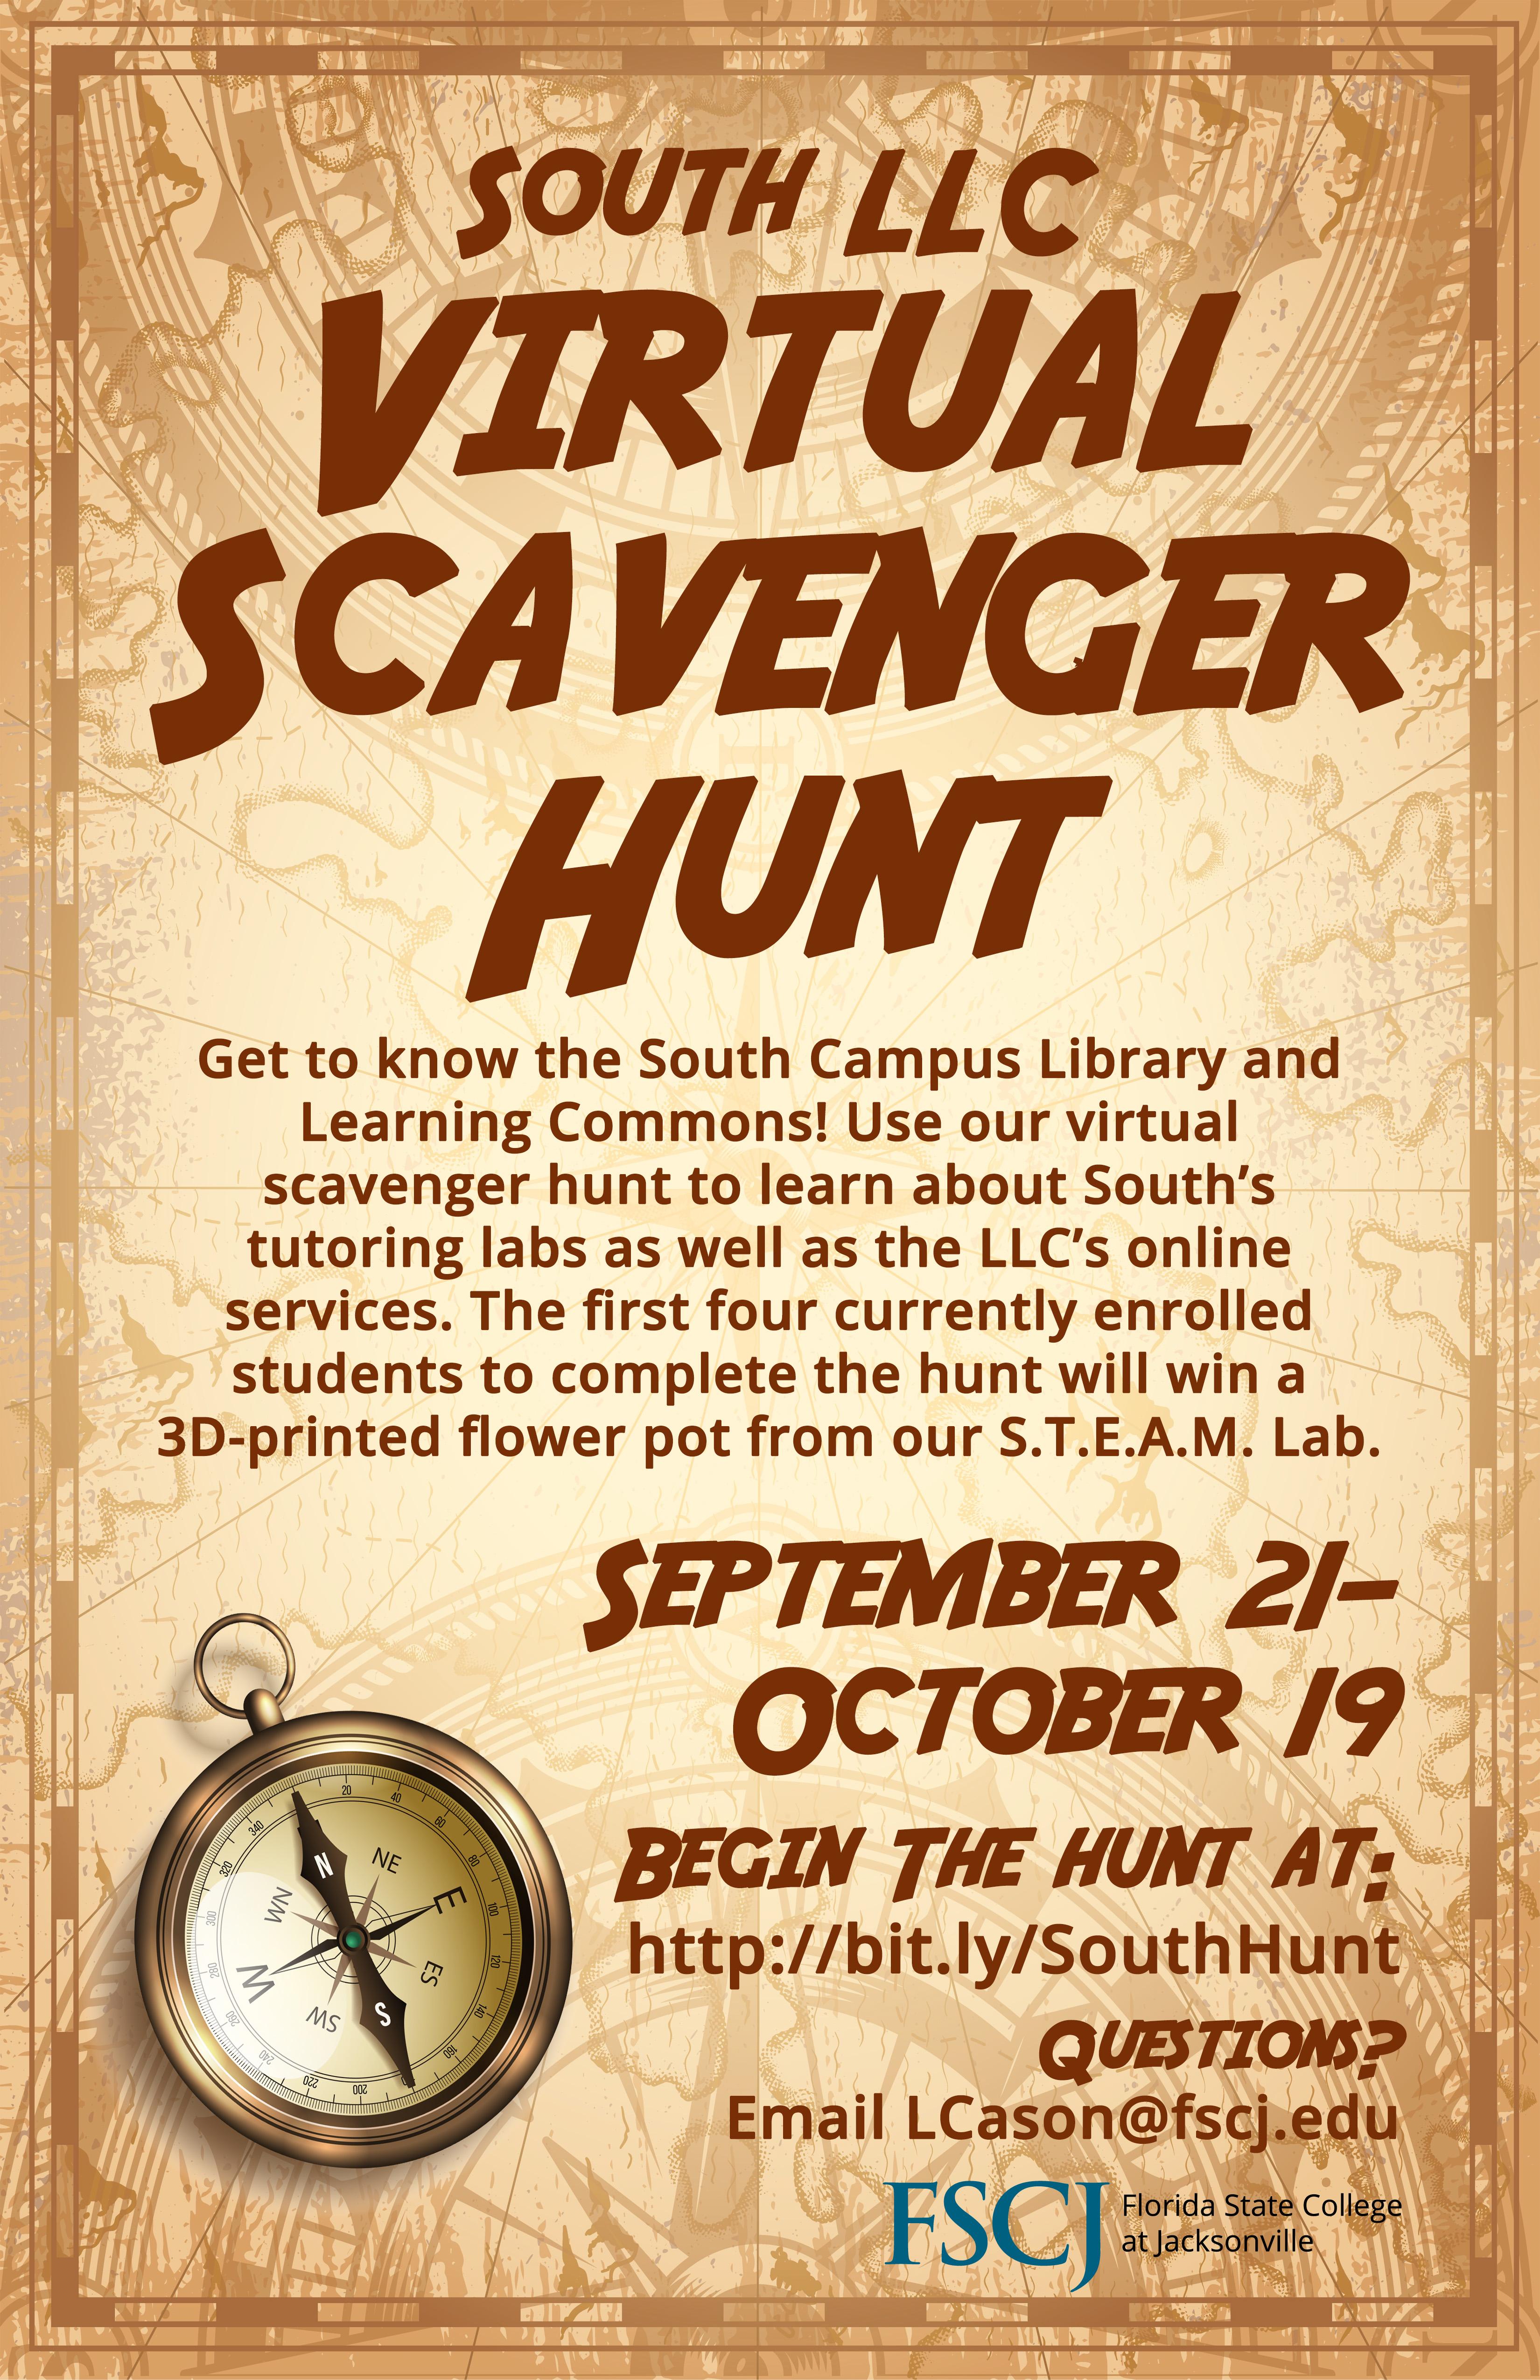 South LLC Virtual Scavenger Hunt